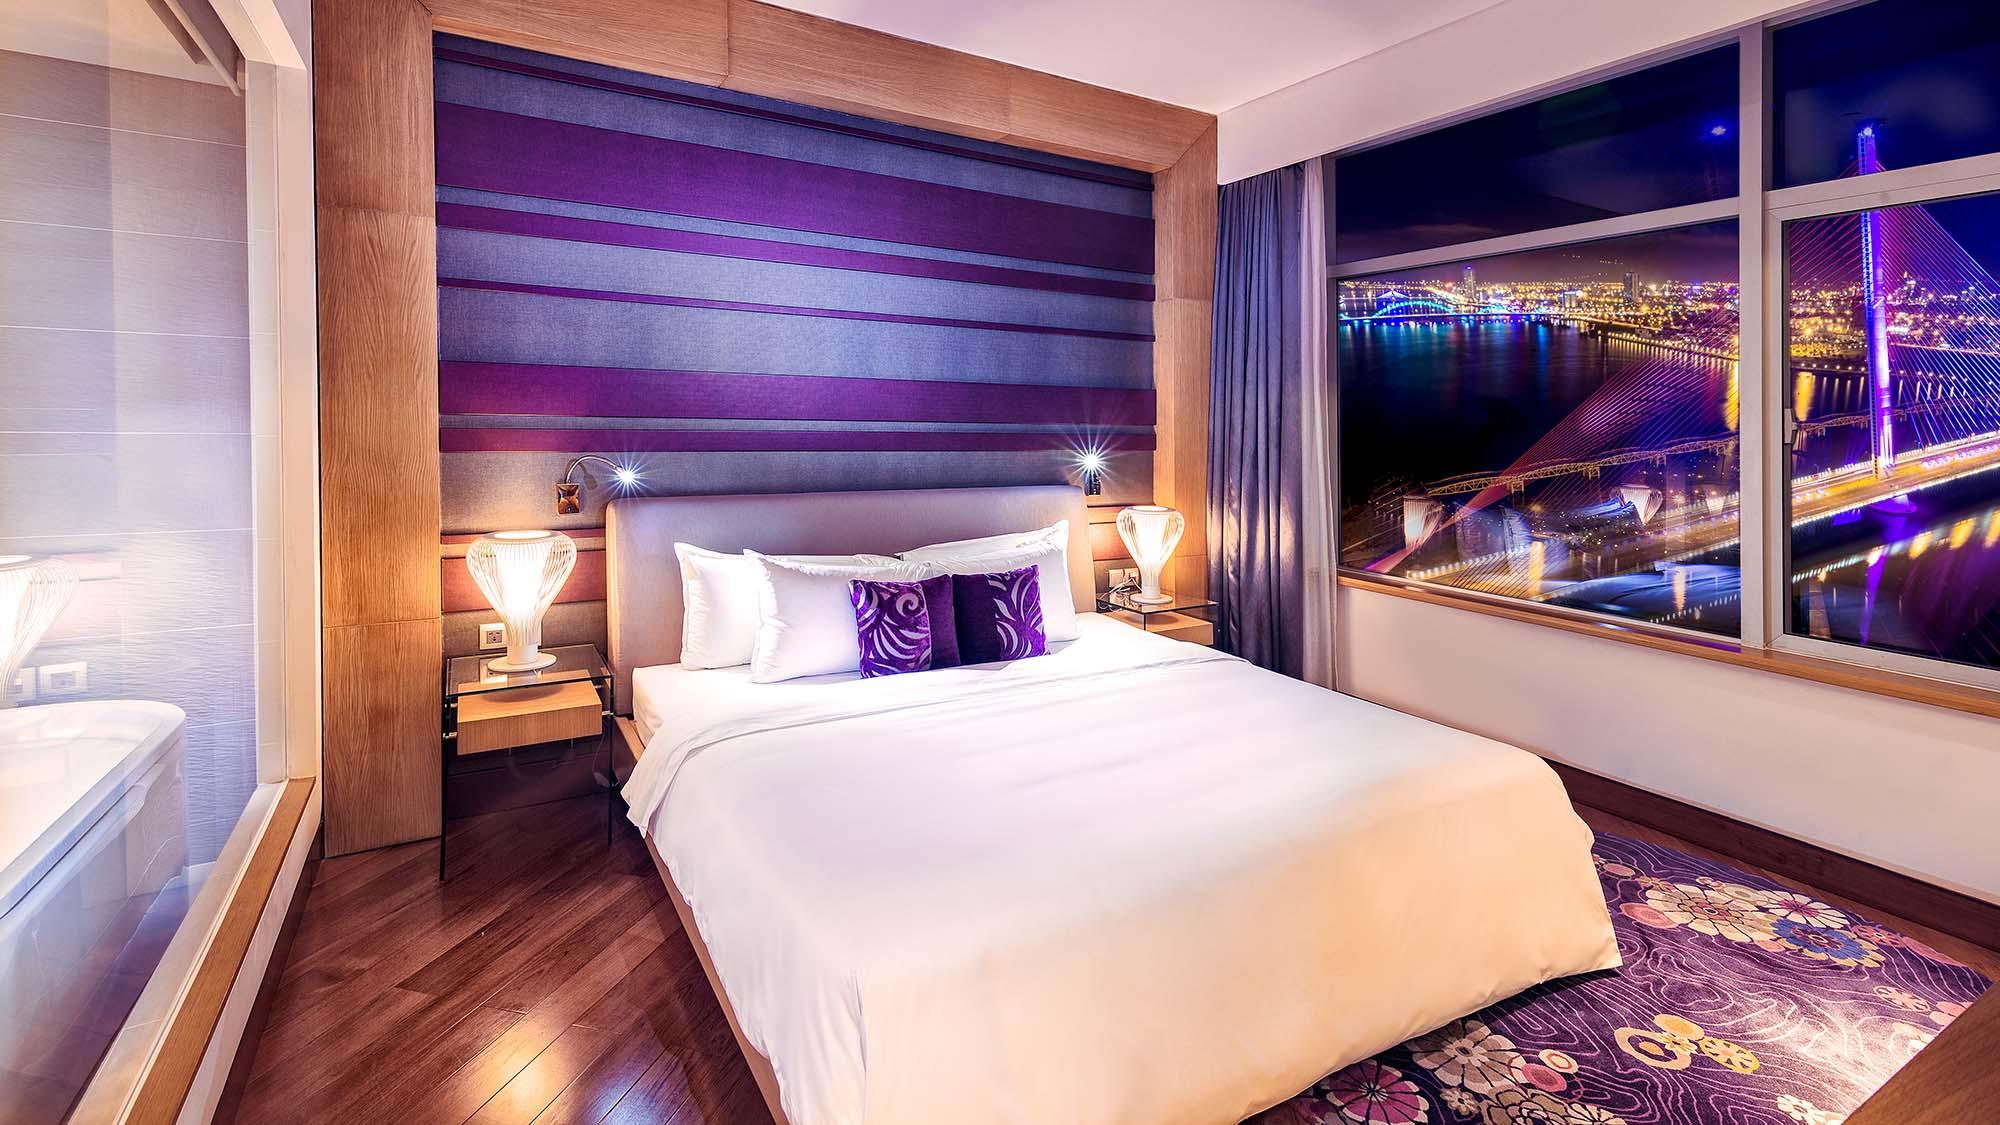 Suite Room Khach San Grand Mercure Danang Fantasticity Com 03